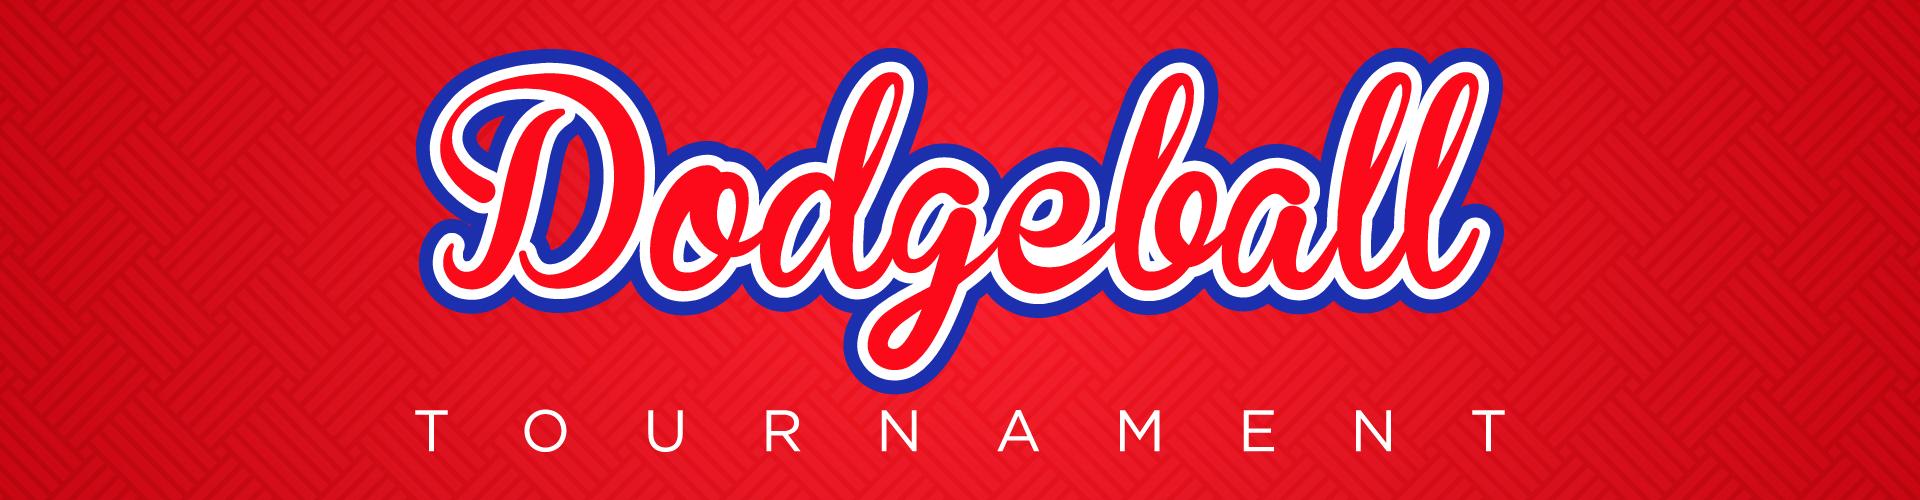 Dodgeball Web Graphic-01.jpg